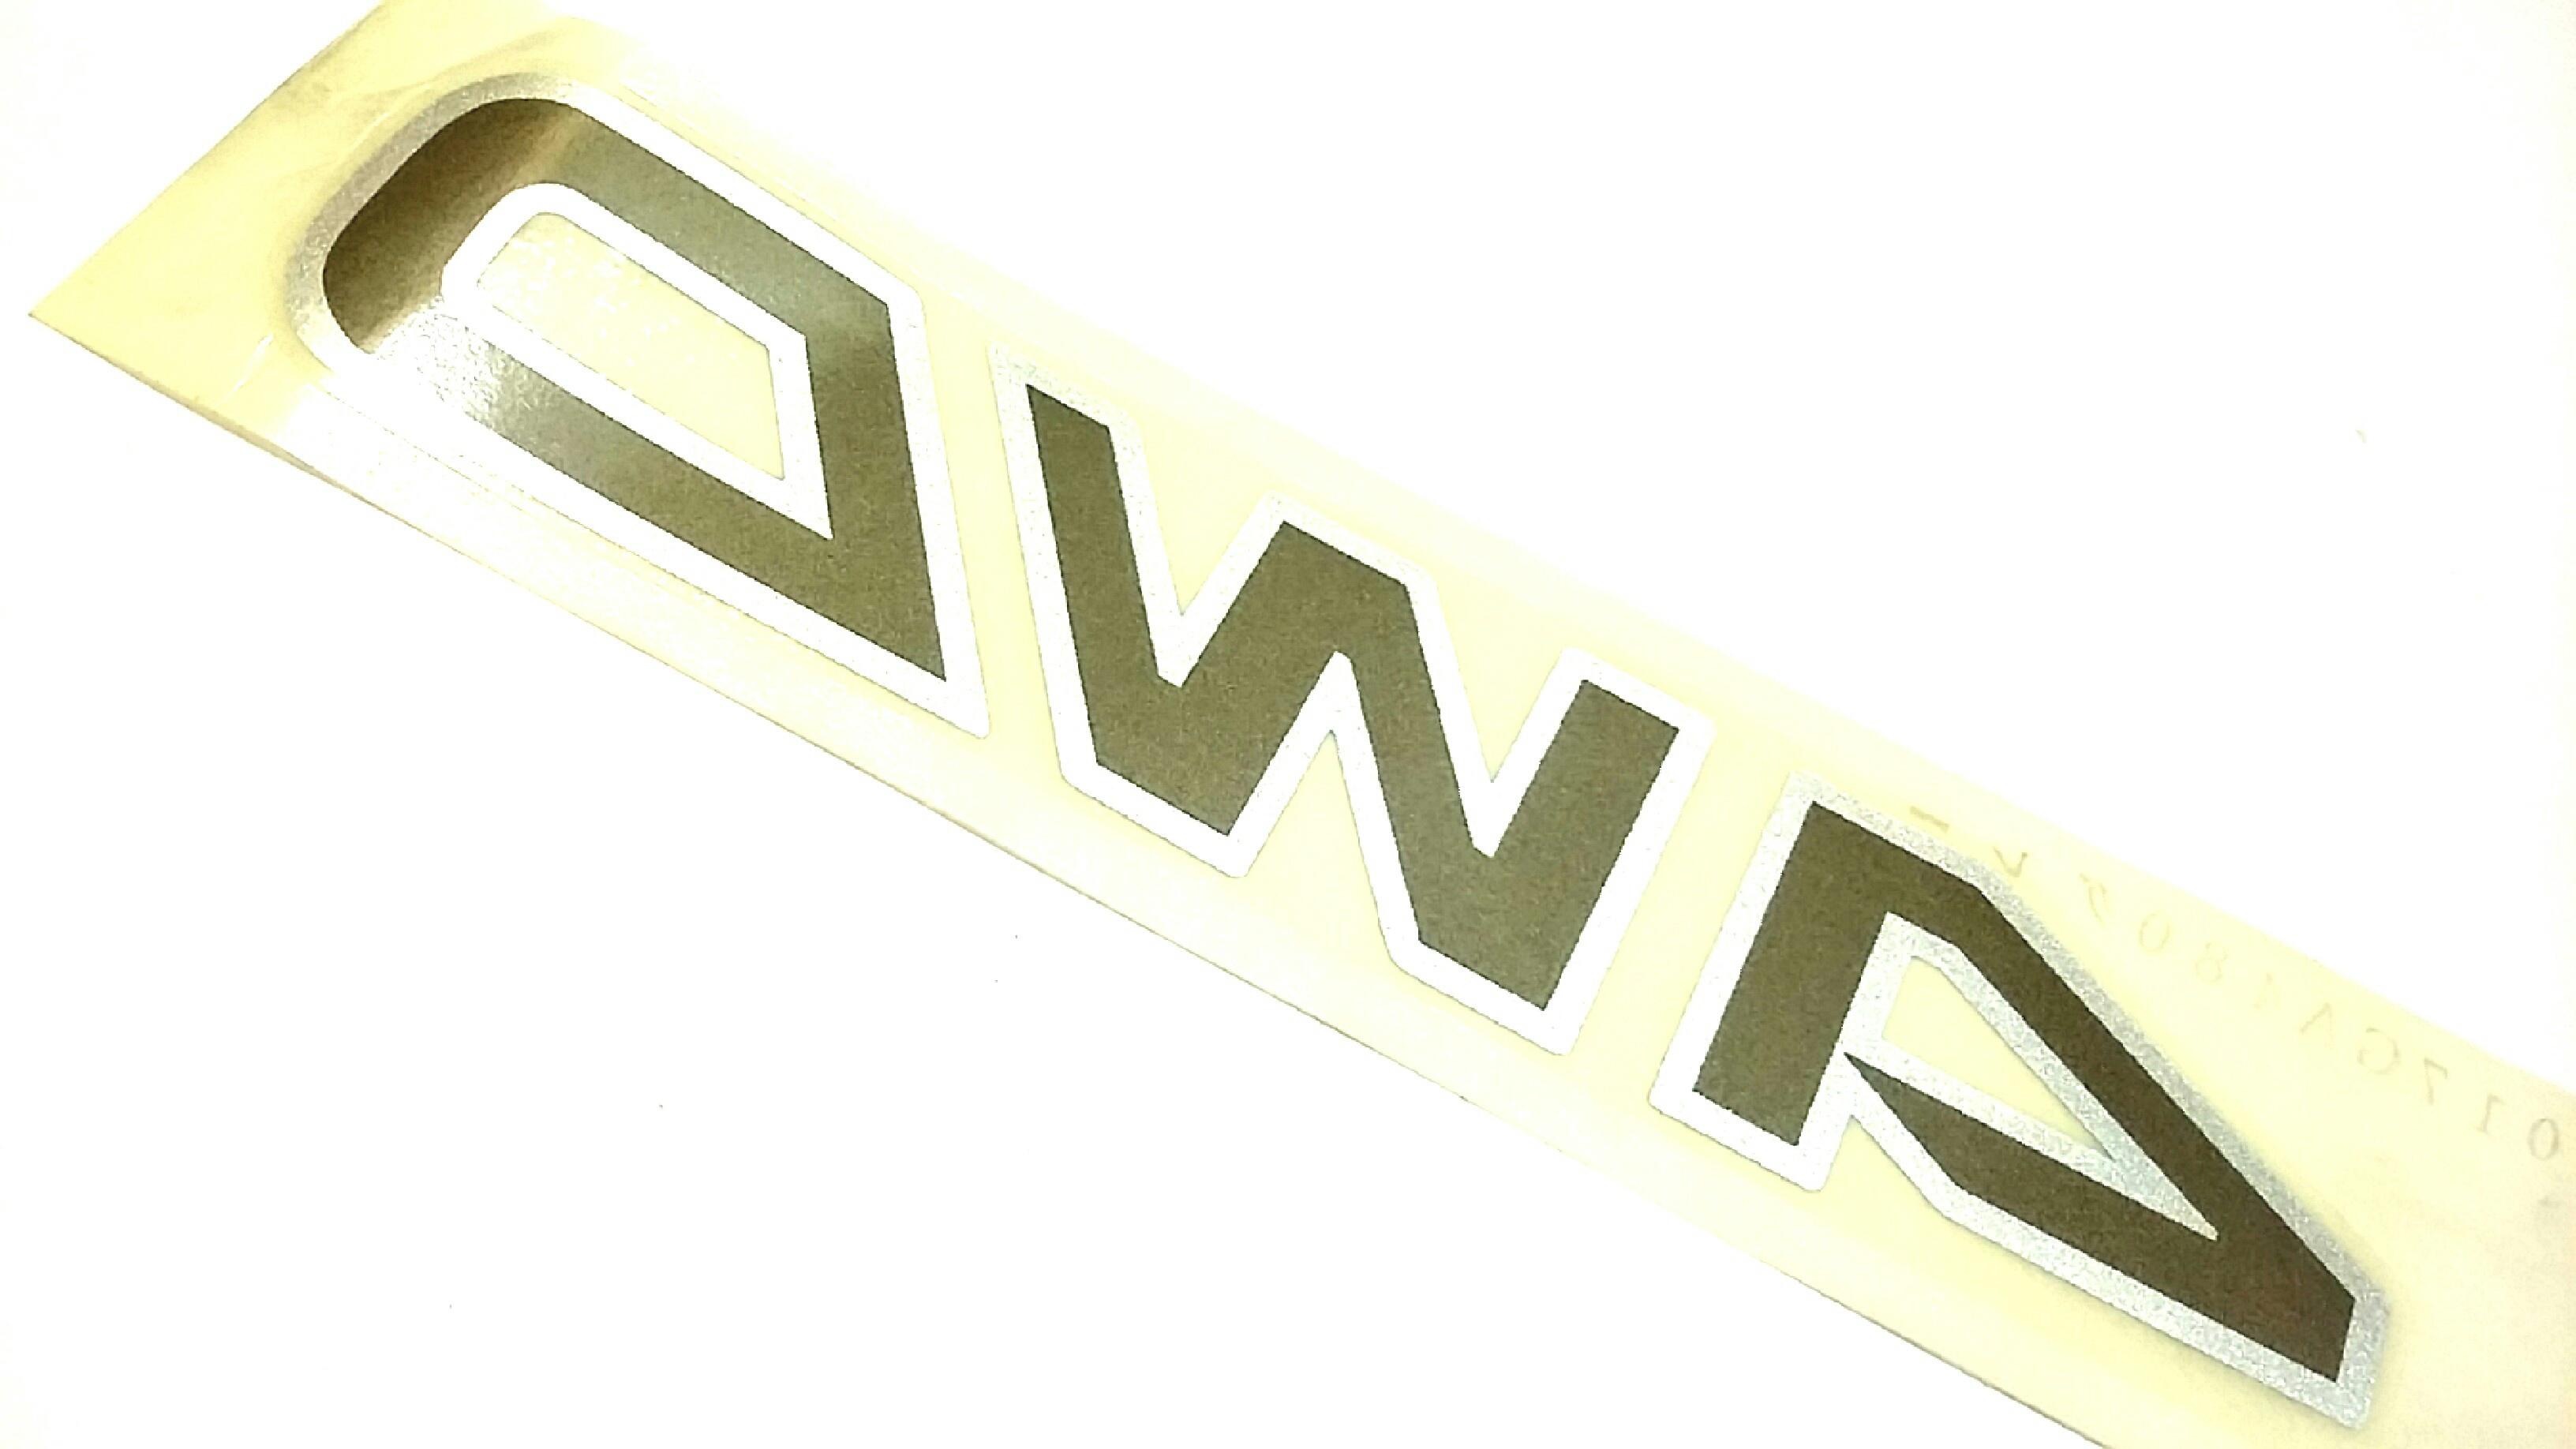 1988 Subaru Dl  Gl  Gl10  Rs  Rx Letter Mark 4wd Side  Pt511788 Letter Mark 4wd   Grey  Silver   4wd